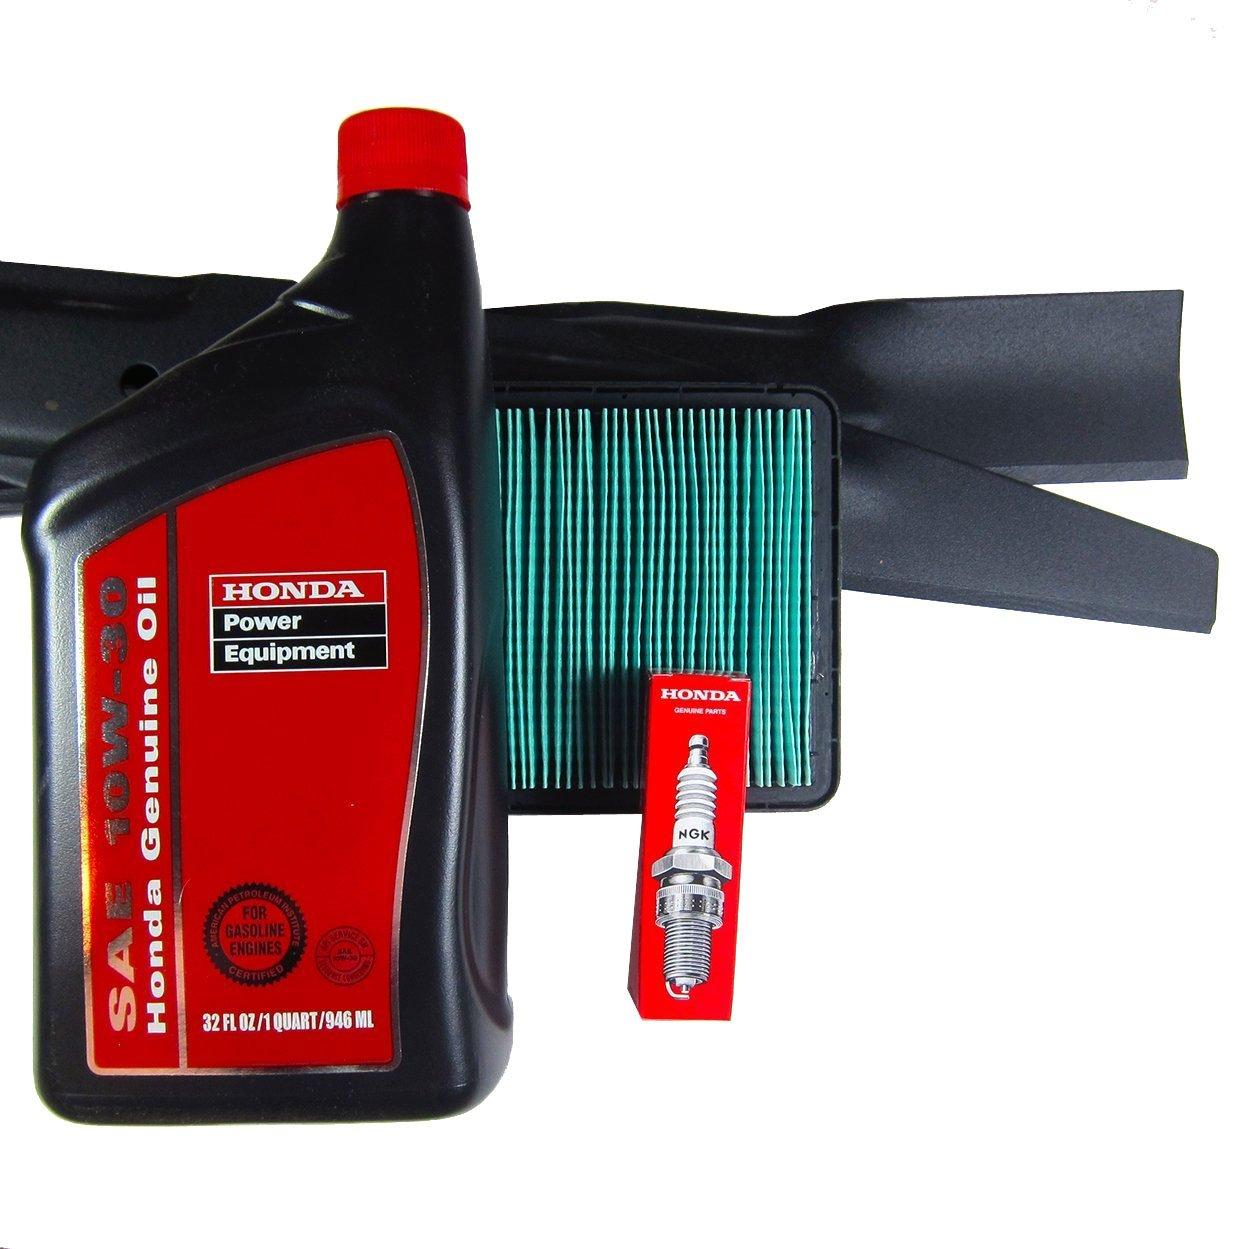 Amazon.com : Honda HRR216 Series Tune-Up Kit (Serial Range MZCG-6000001 to  MZCG-7999999) : Garden & Outdoor